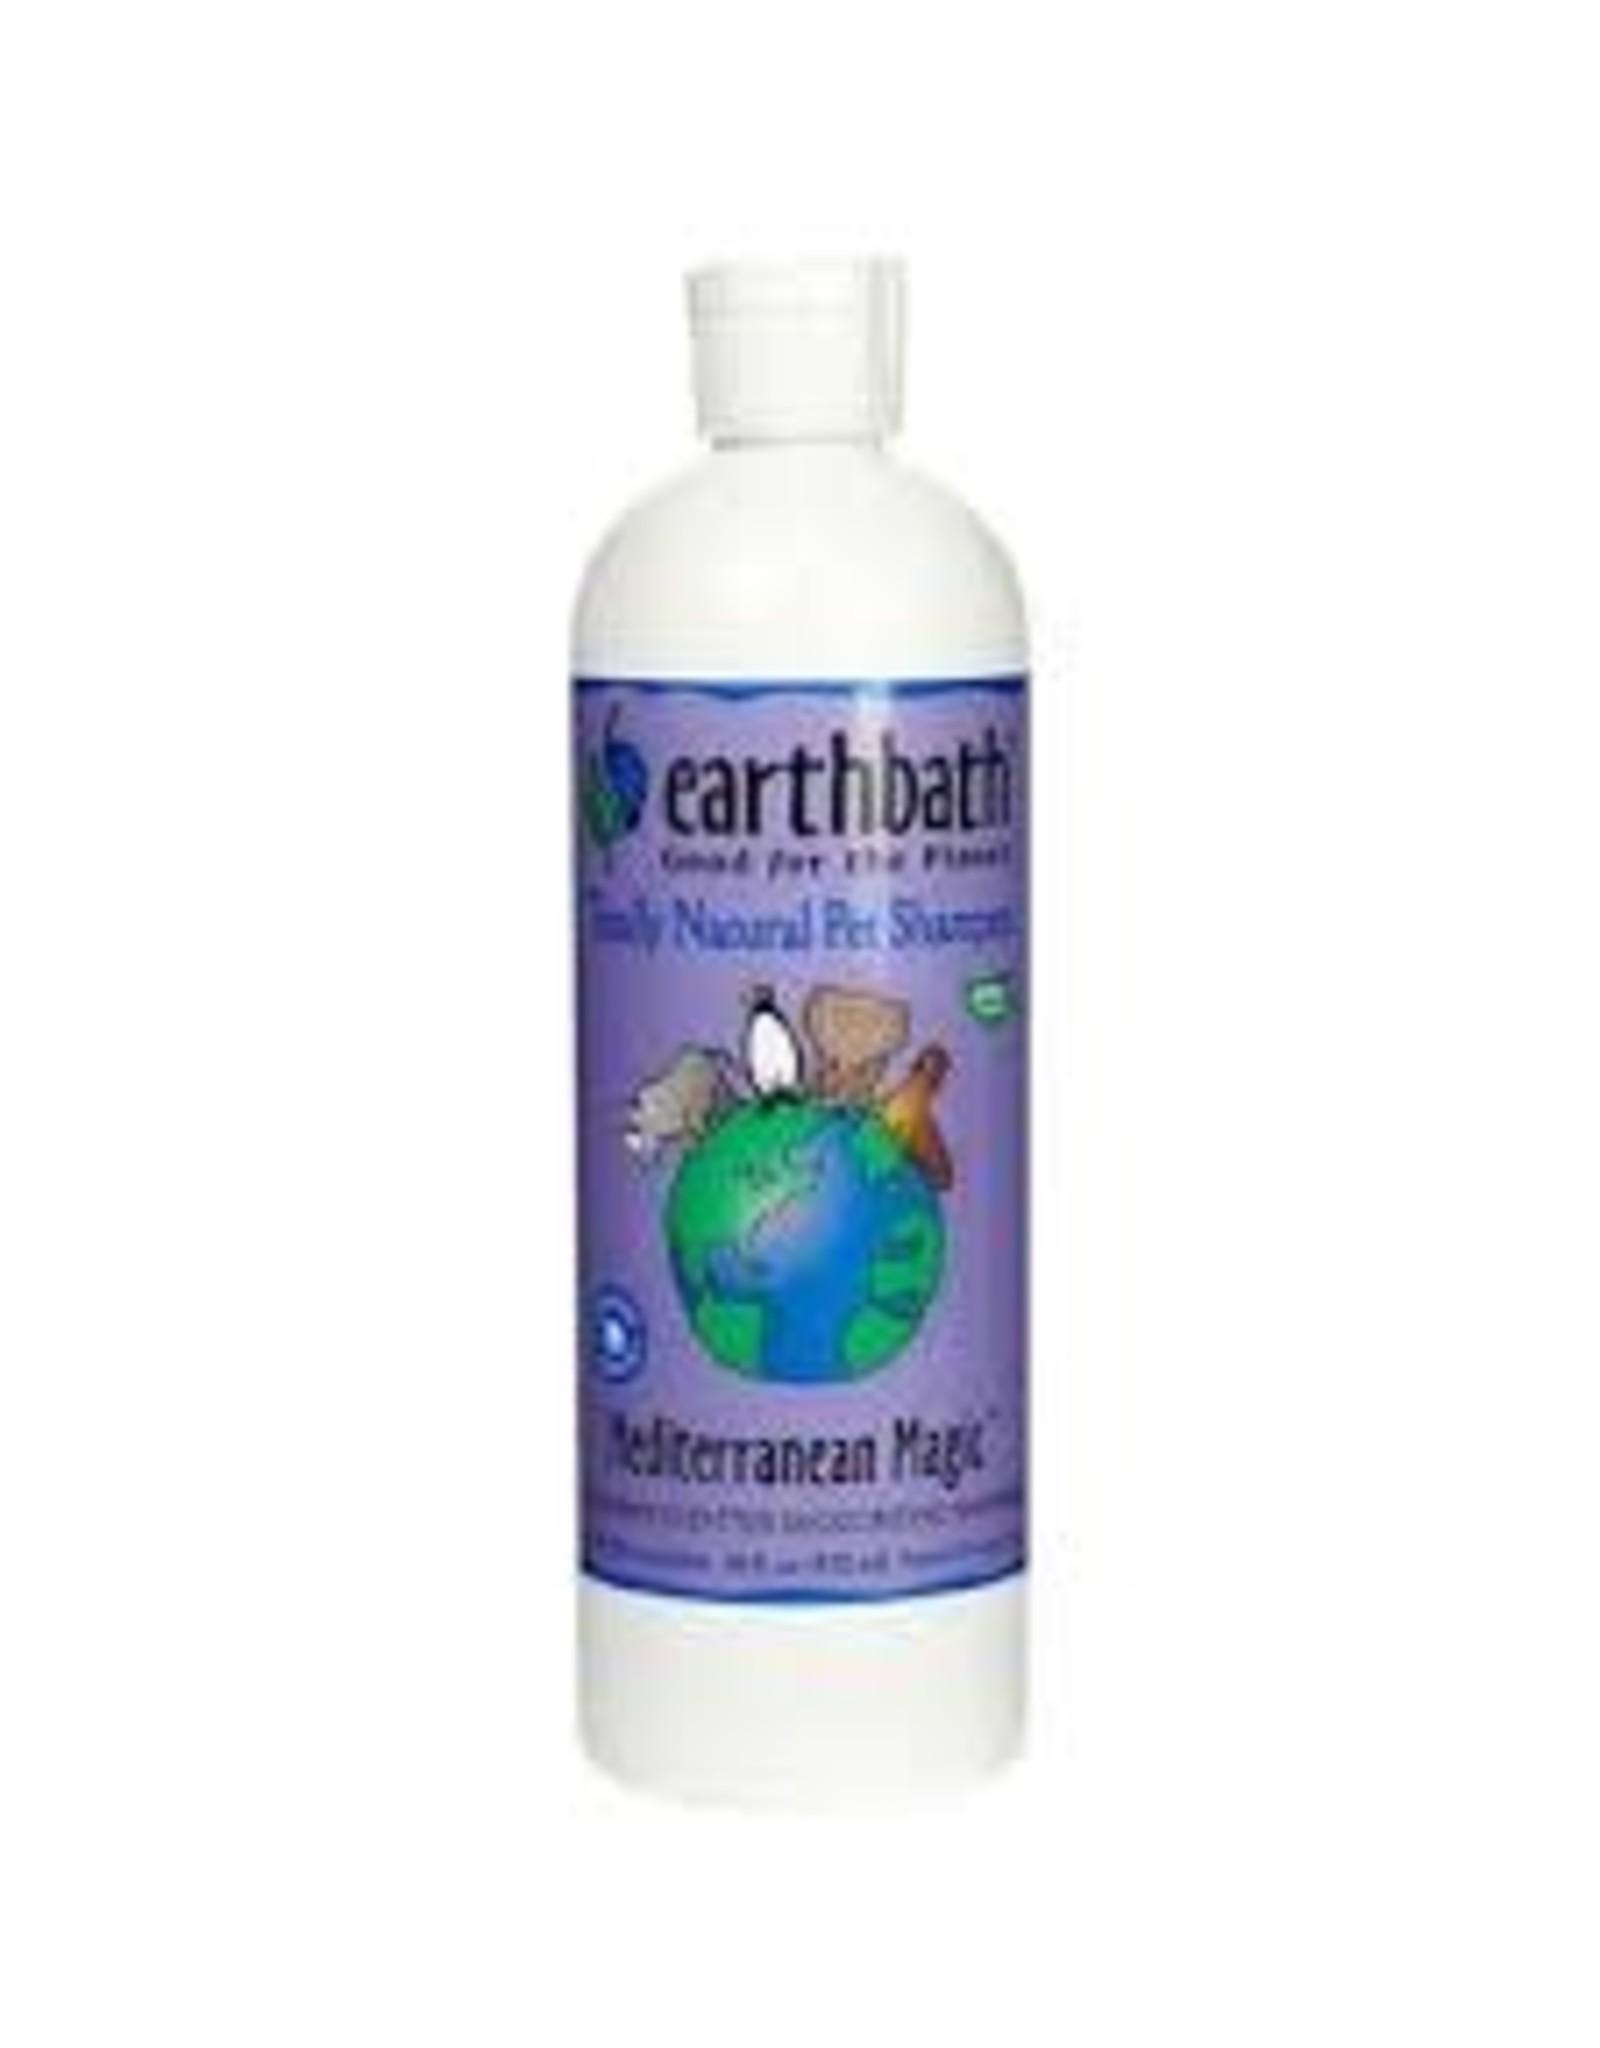 EARTHBATH EARTHBATH MEDITERRANEAN MAGIC SHAMPOO